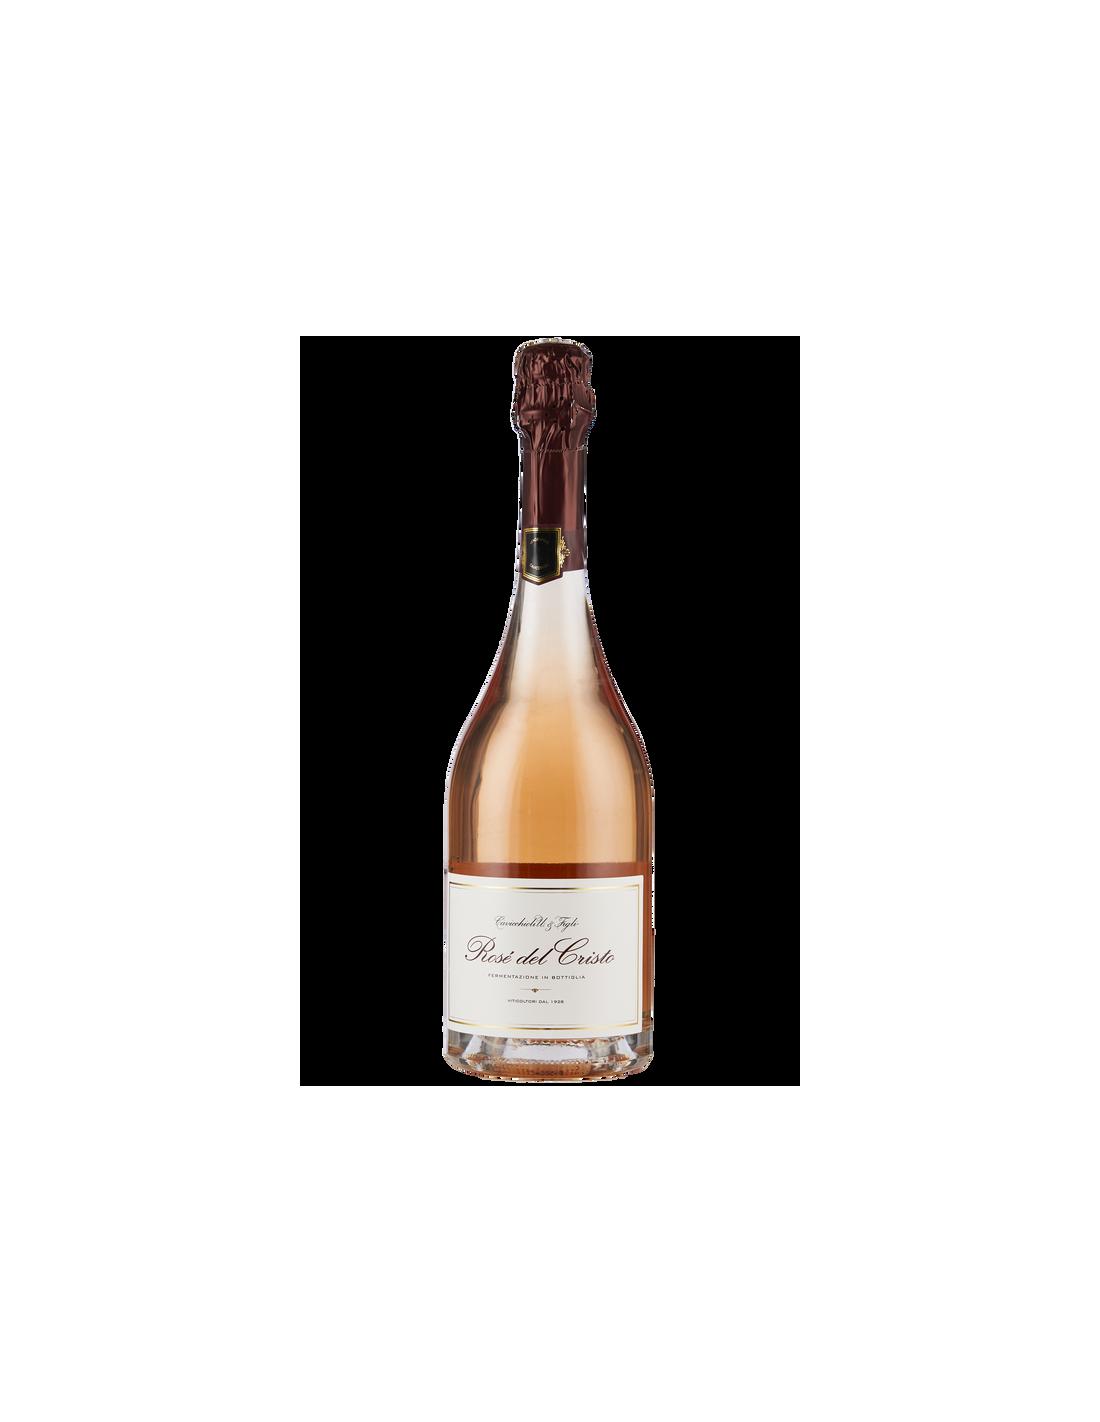 Vin spumant sec Lambrusco Di Sorbara, Cavicchioli Emilia-Romagna, 0.75L, 11% alc., Italia